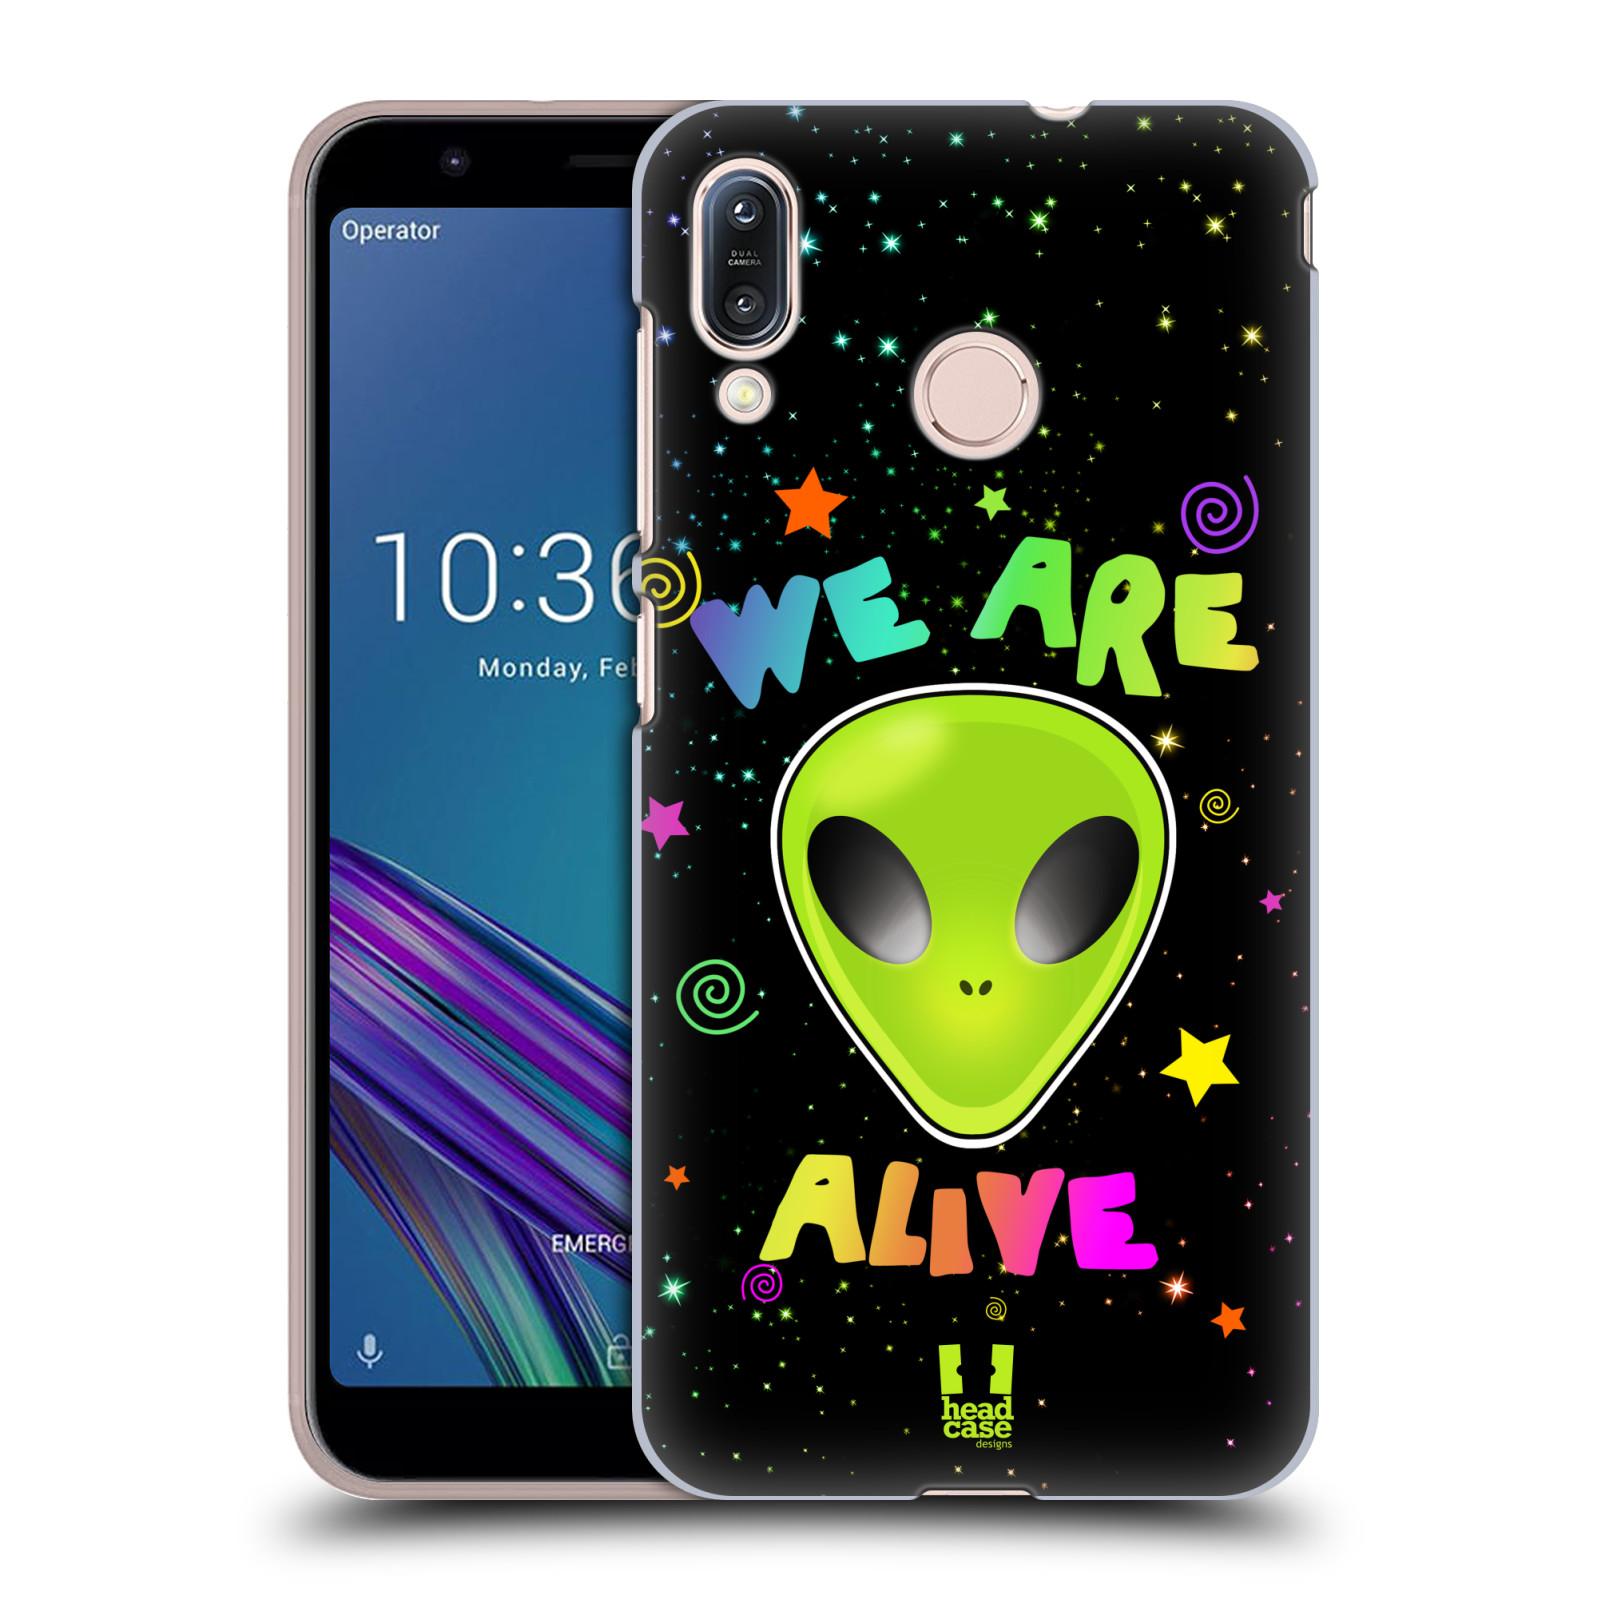 Plastové pouzdro na mobil Asus Zenfone Max M1 ZB555KL - Head Case - ALIENS ALIVE